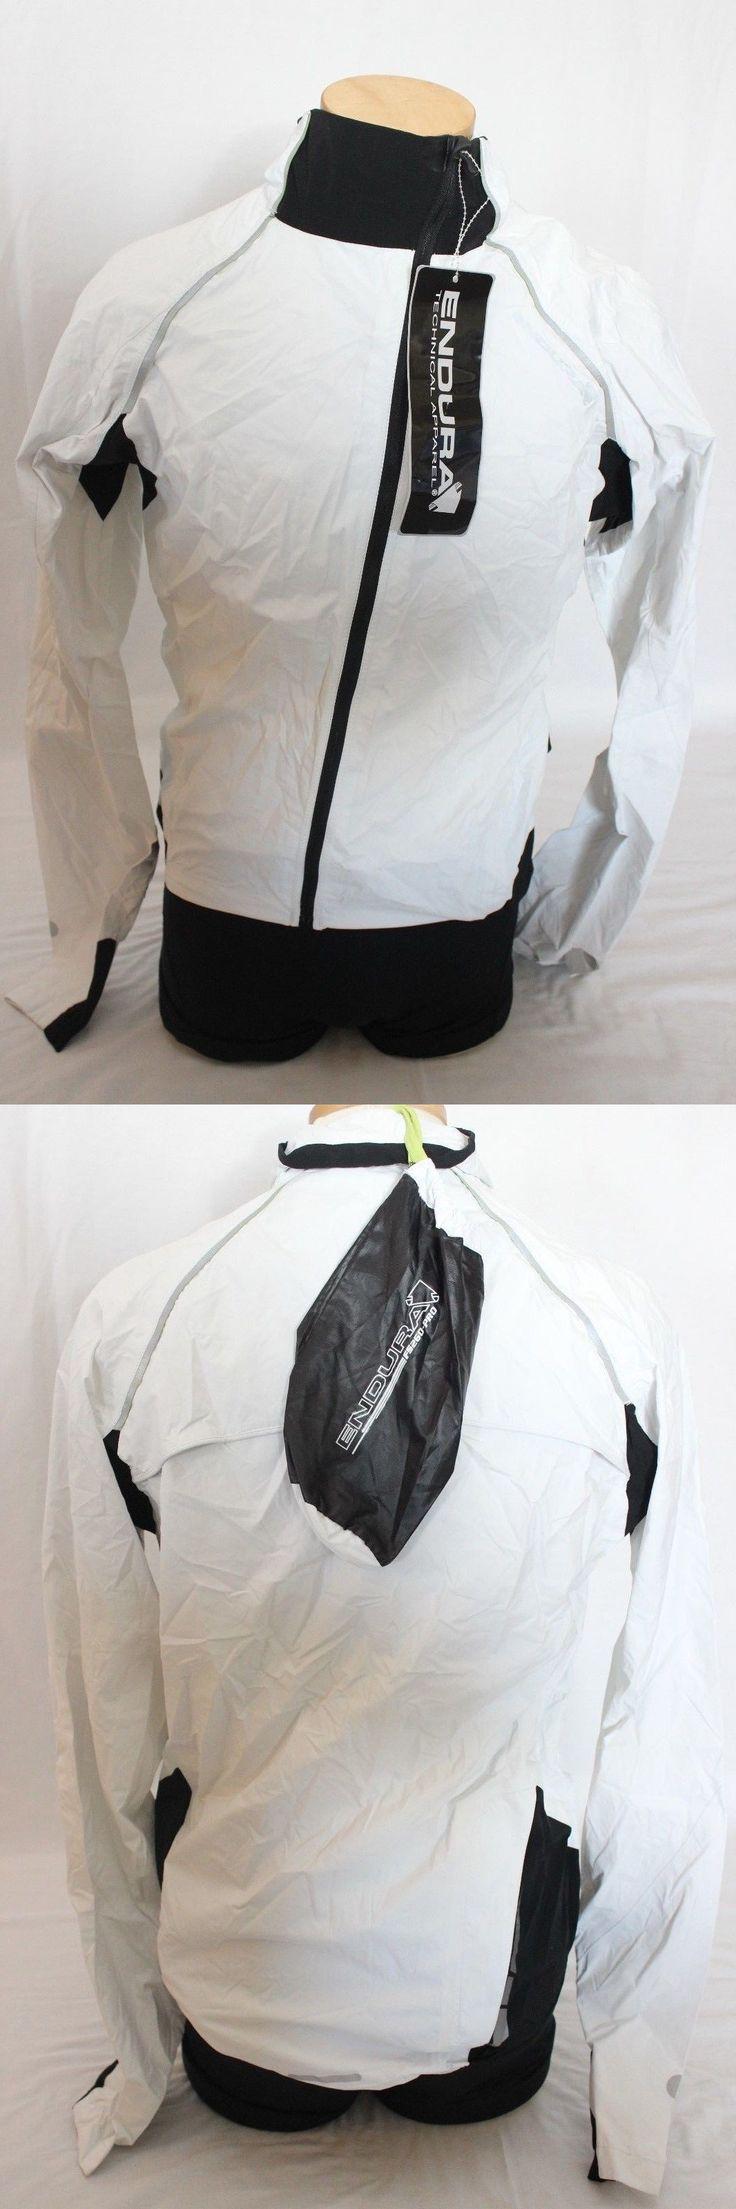 Jackets 36124: New Endura Men S Helium Cycling Bike Medium Jacket Top Black White Waterproof -> BUY IT NOW ONLY: $70 on eBay!